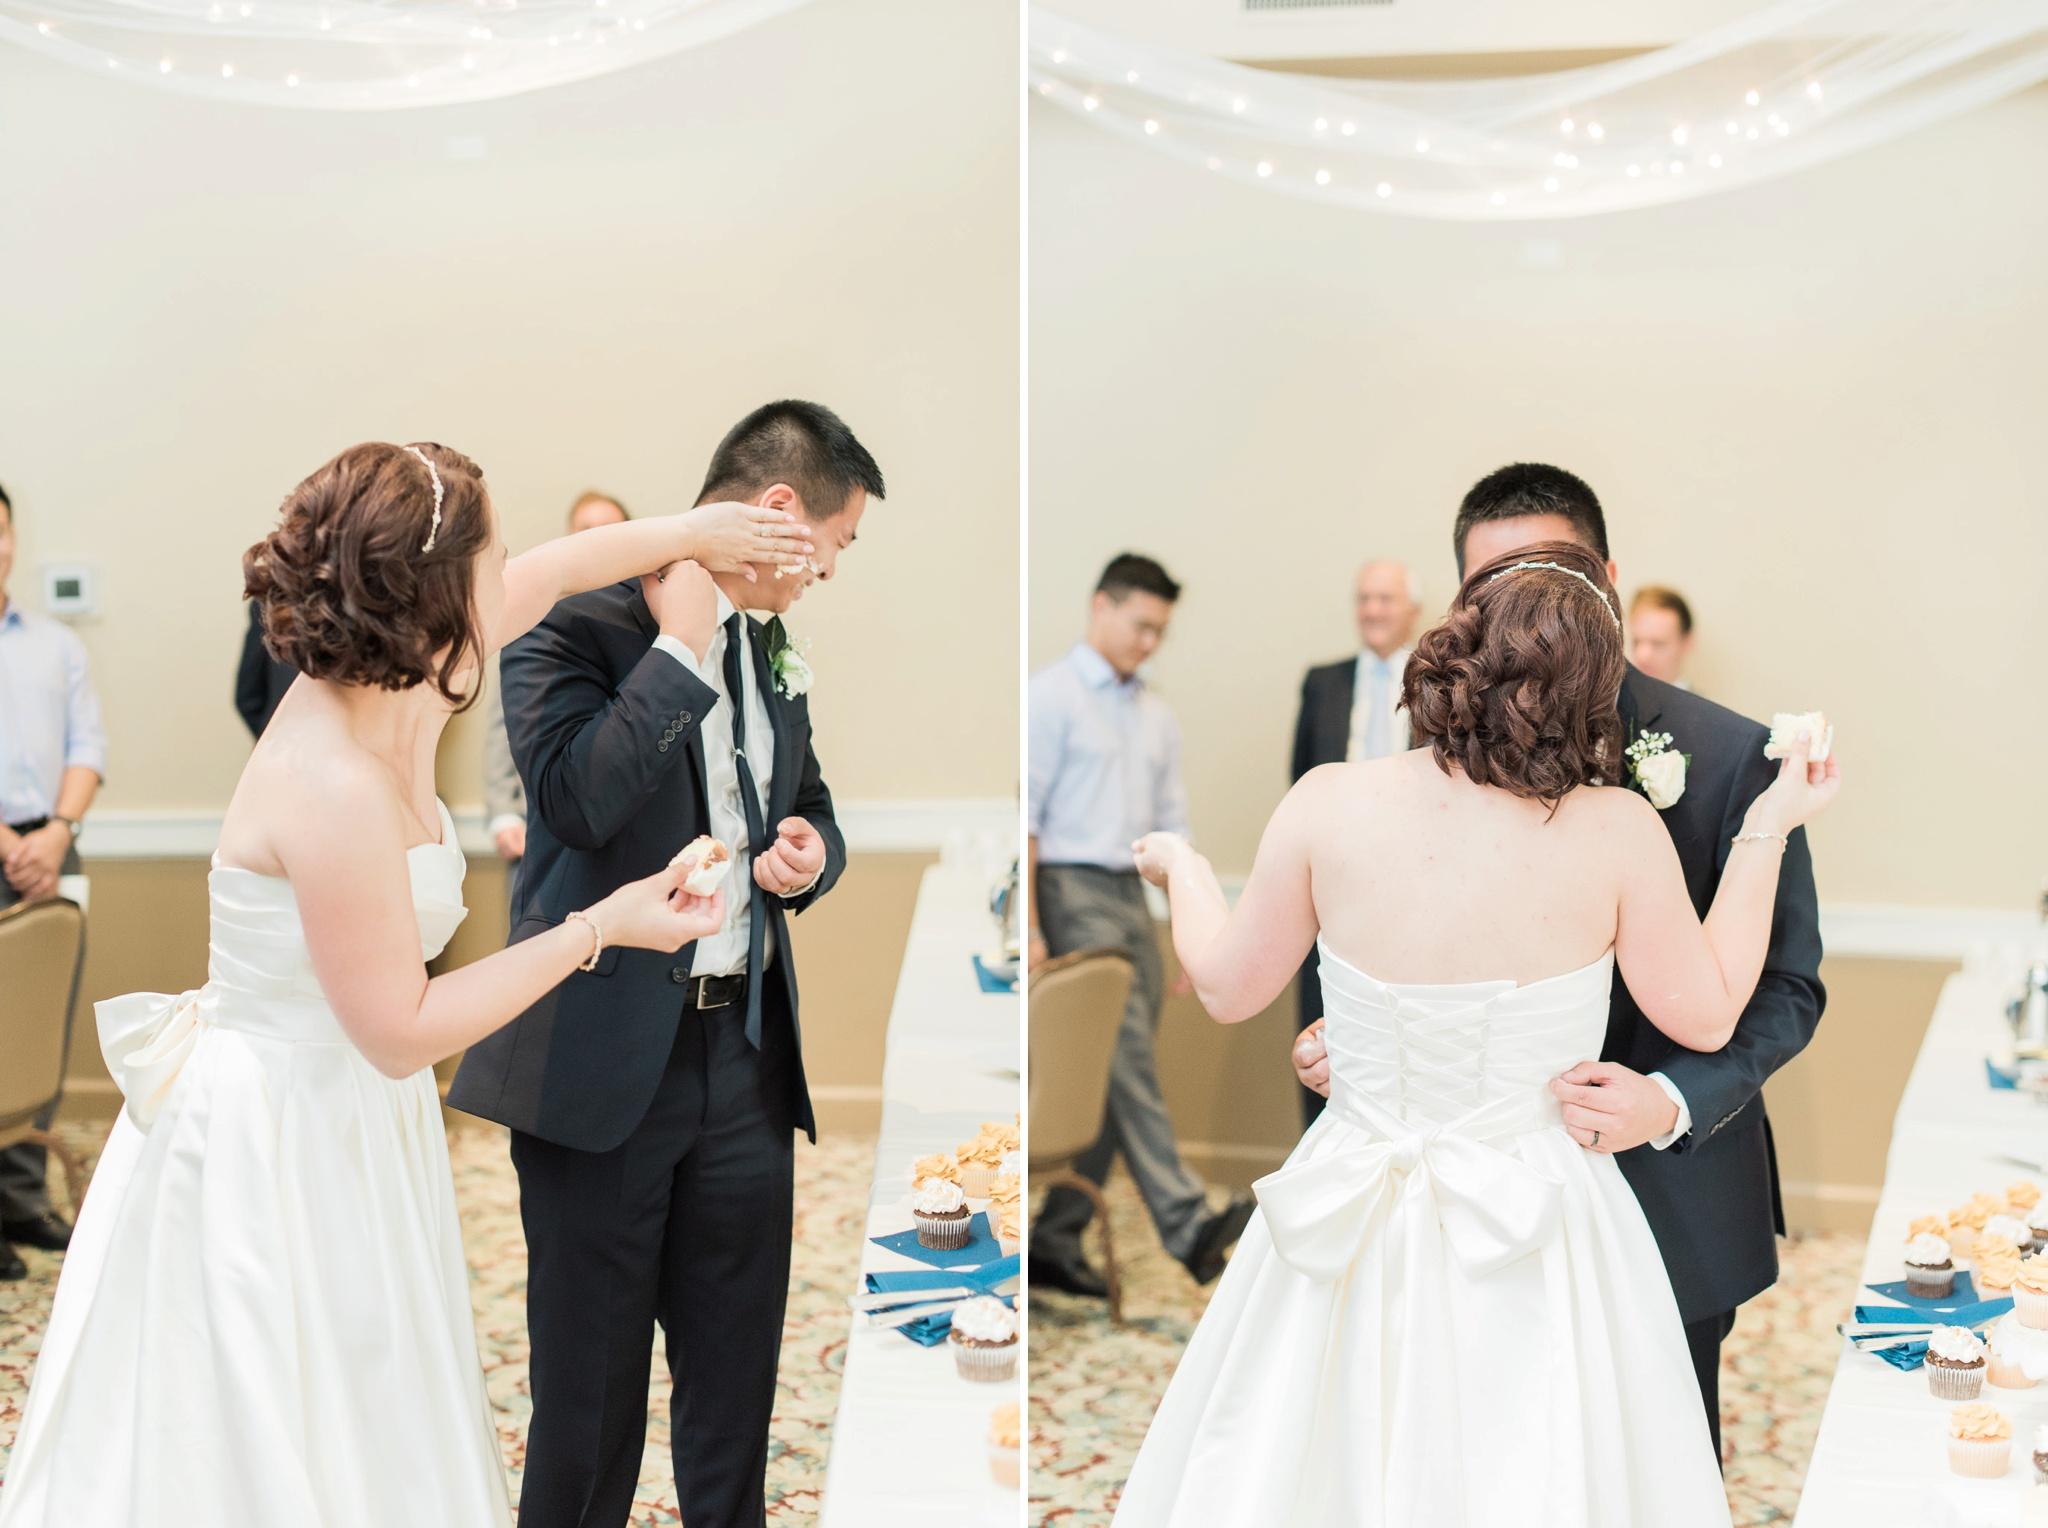 brookside-golf-country-club-wedding-columbus-ohio-137.jpg